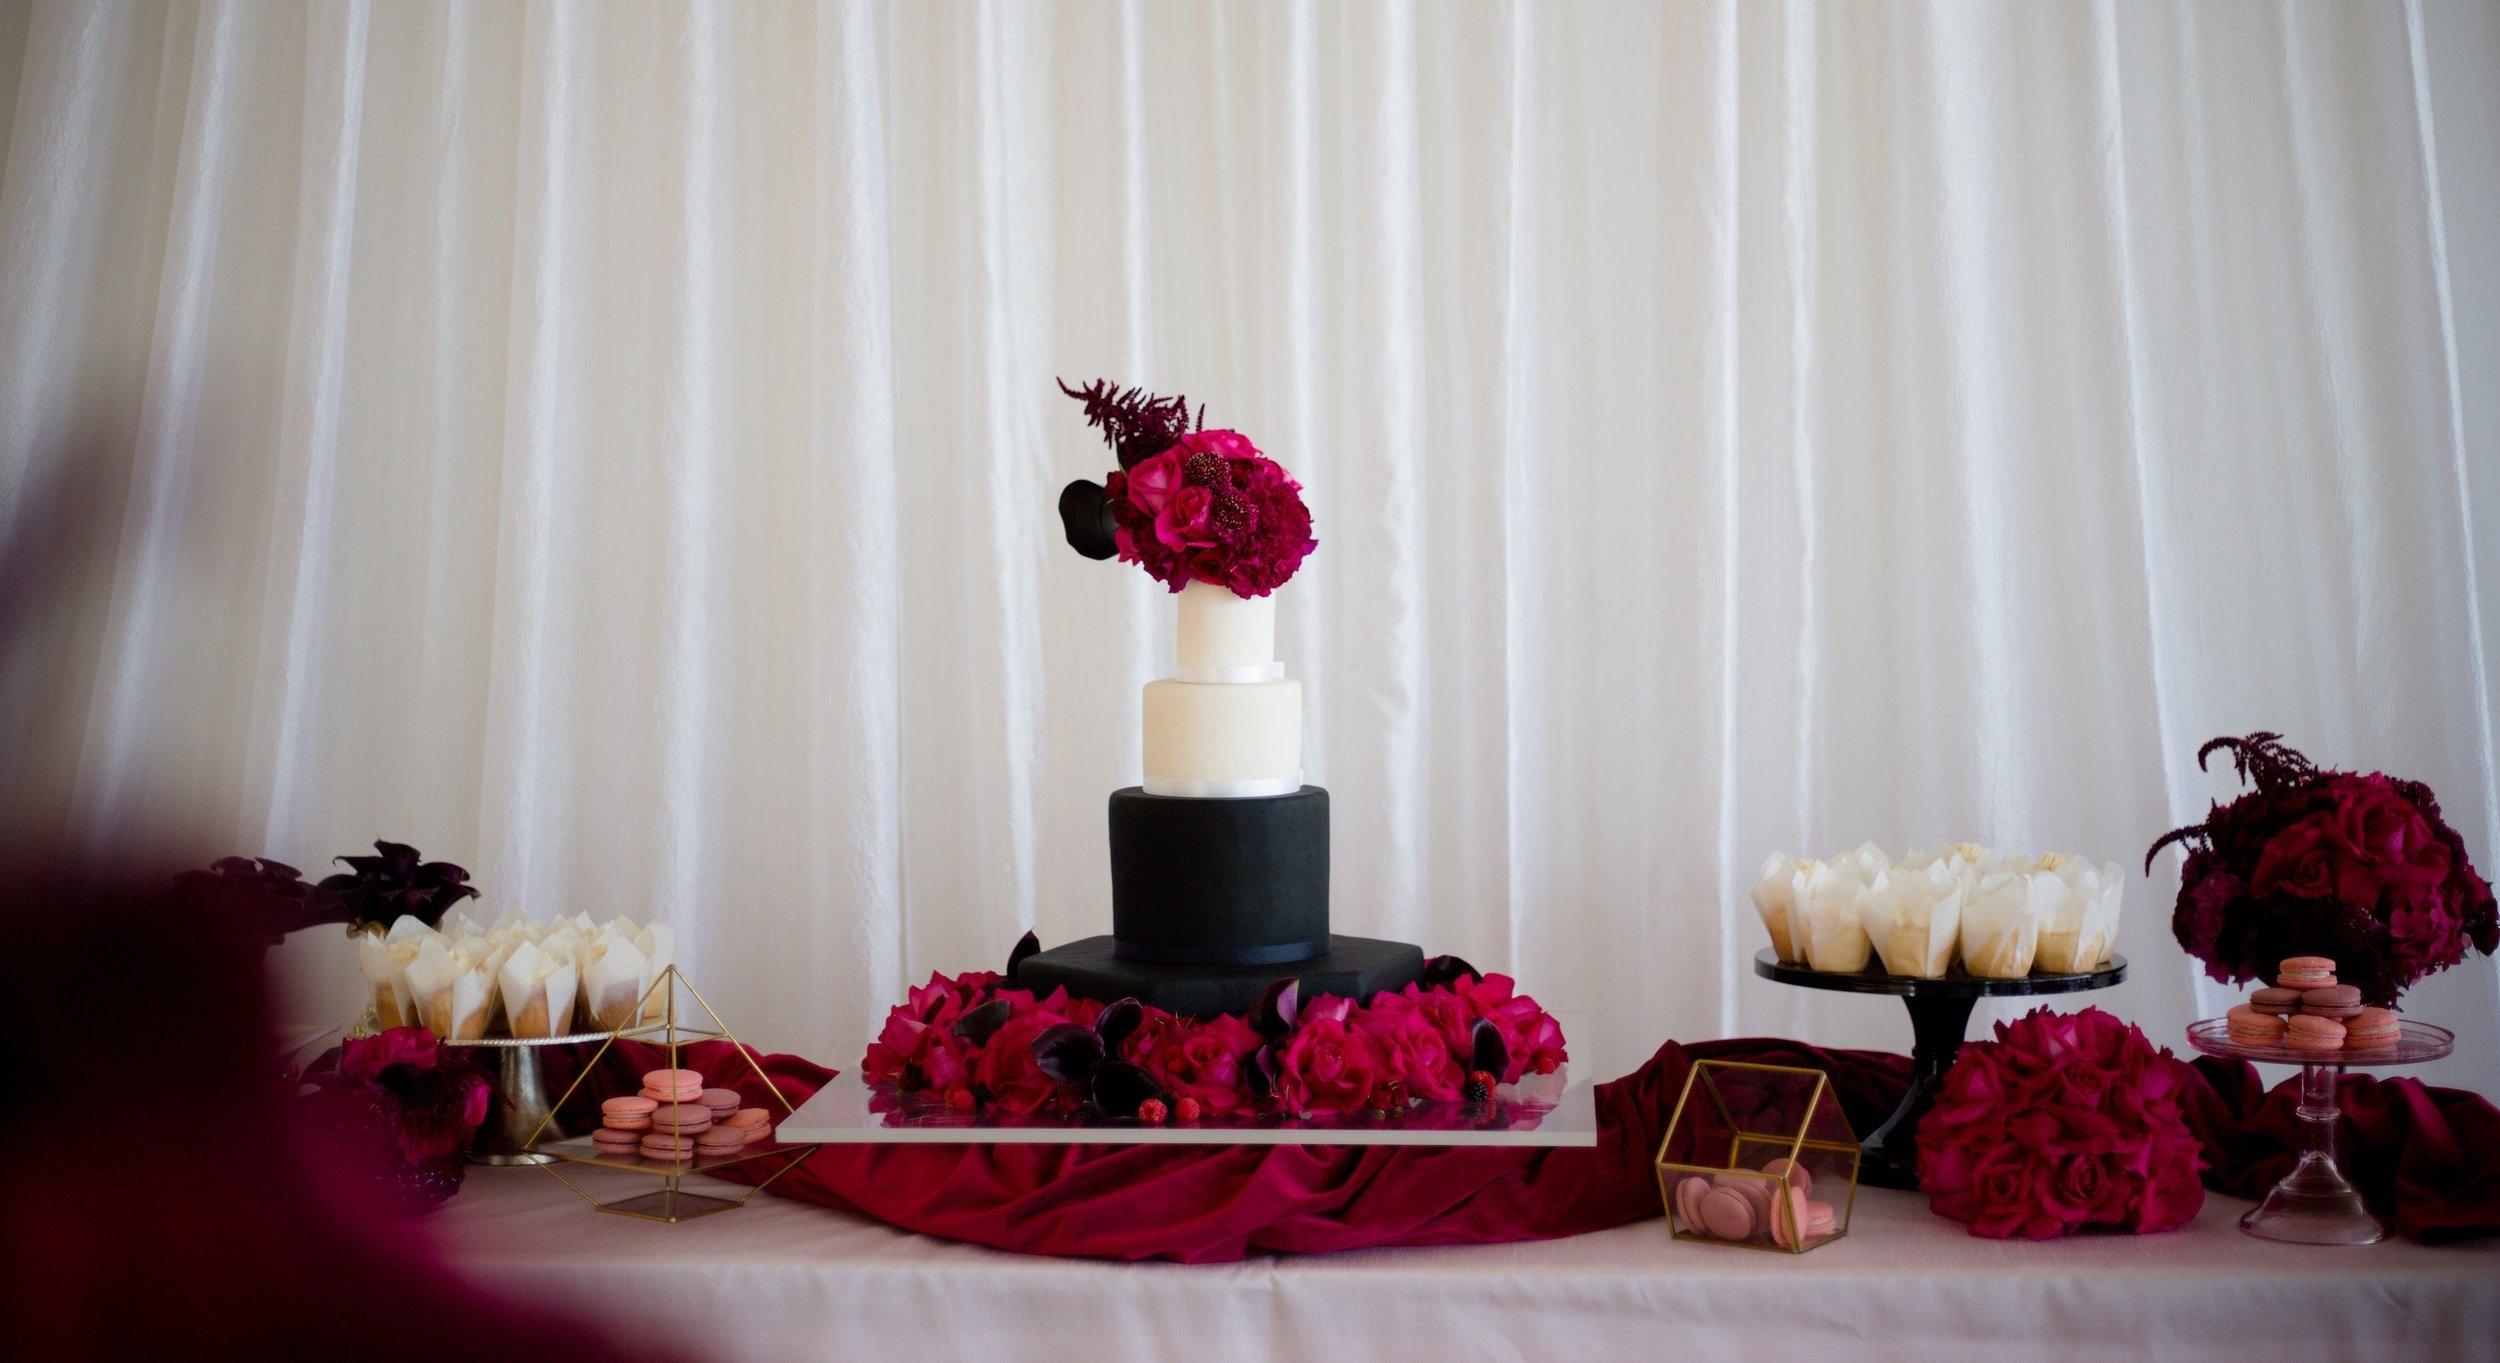 dessert display with cake.jpg